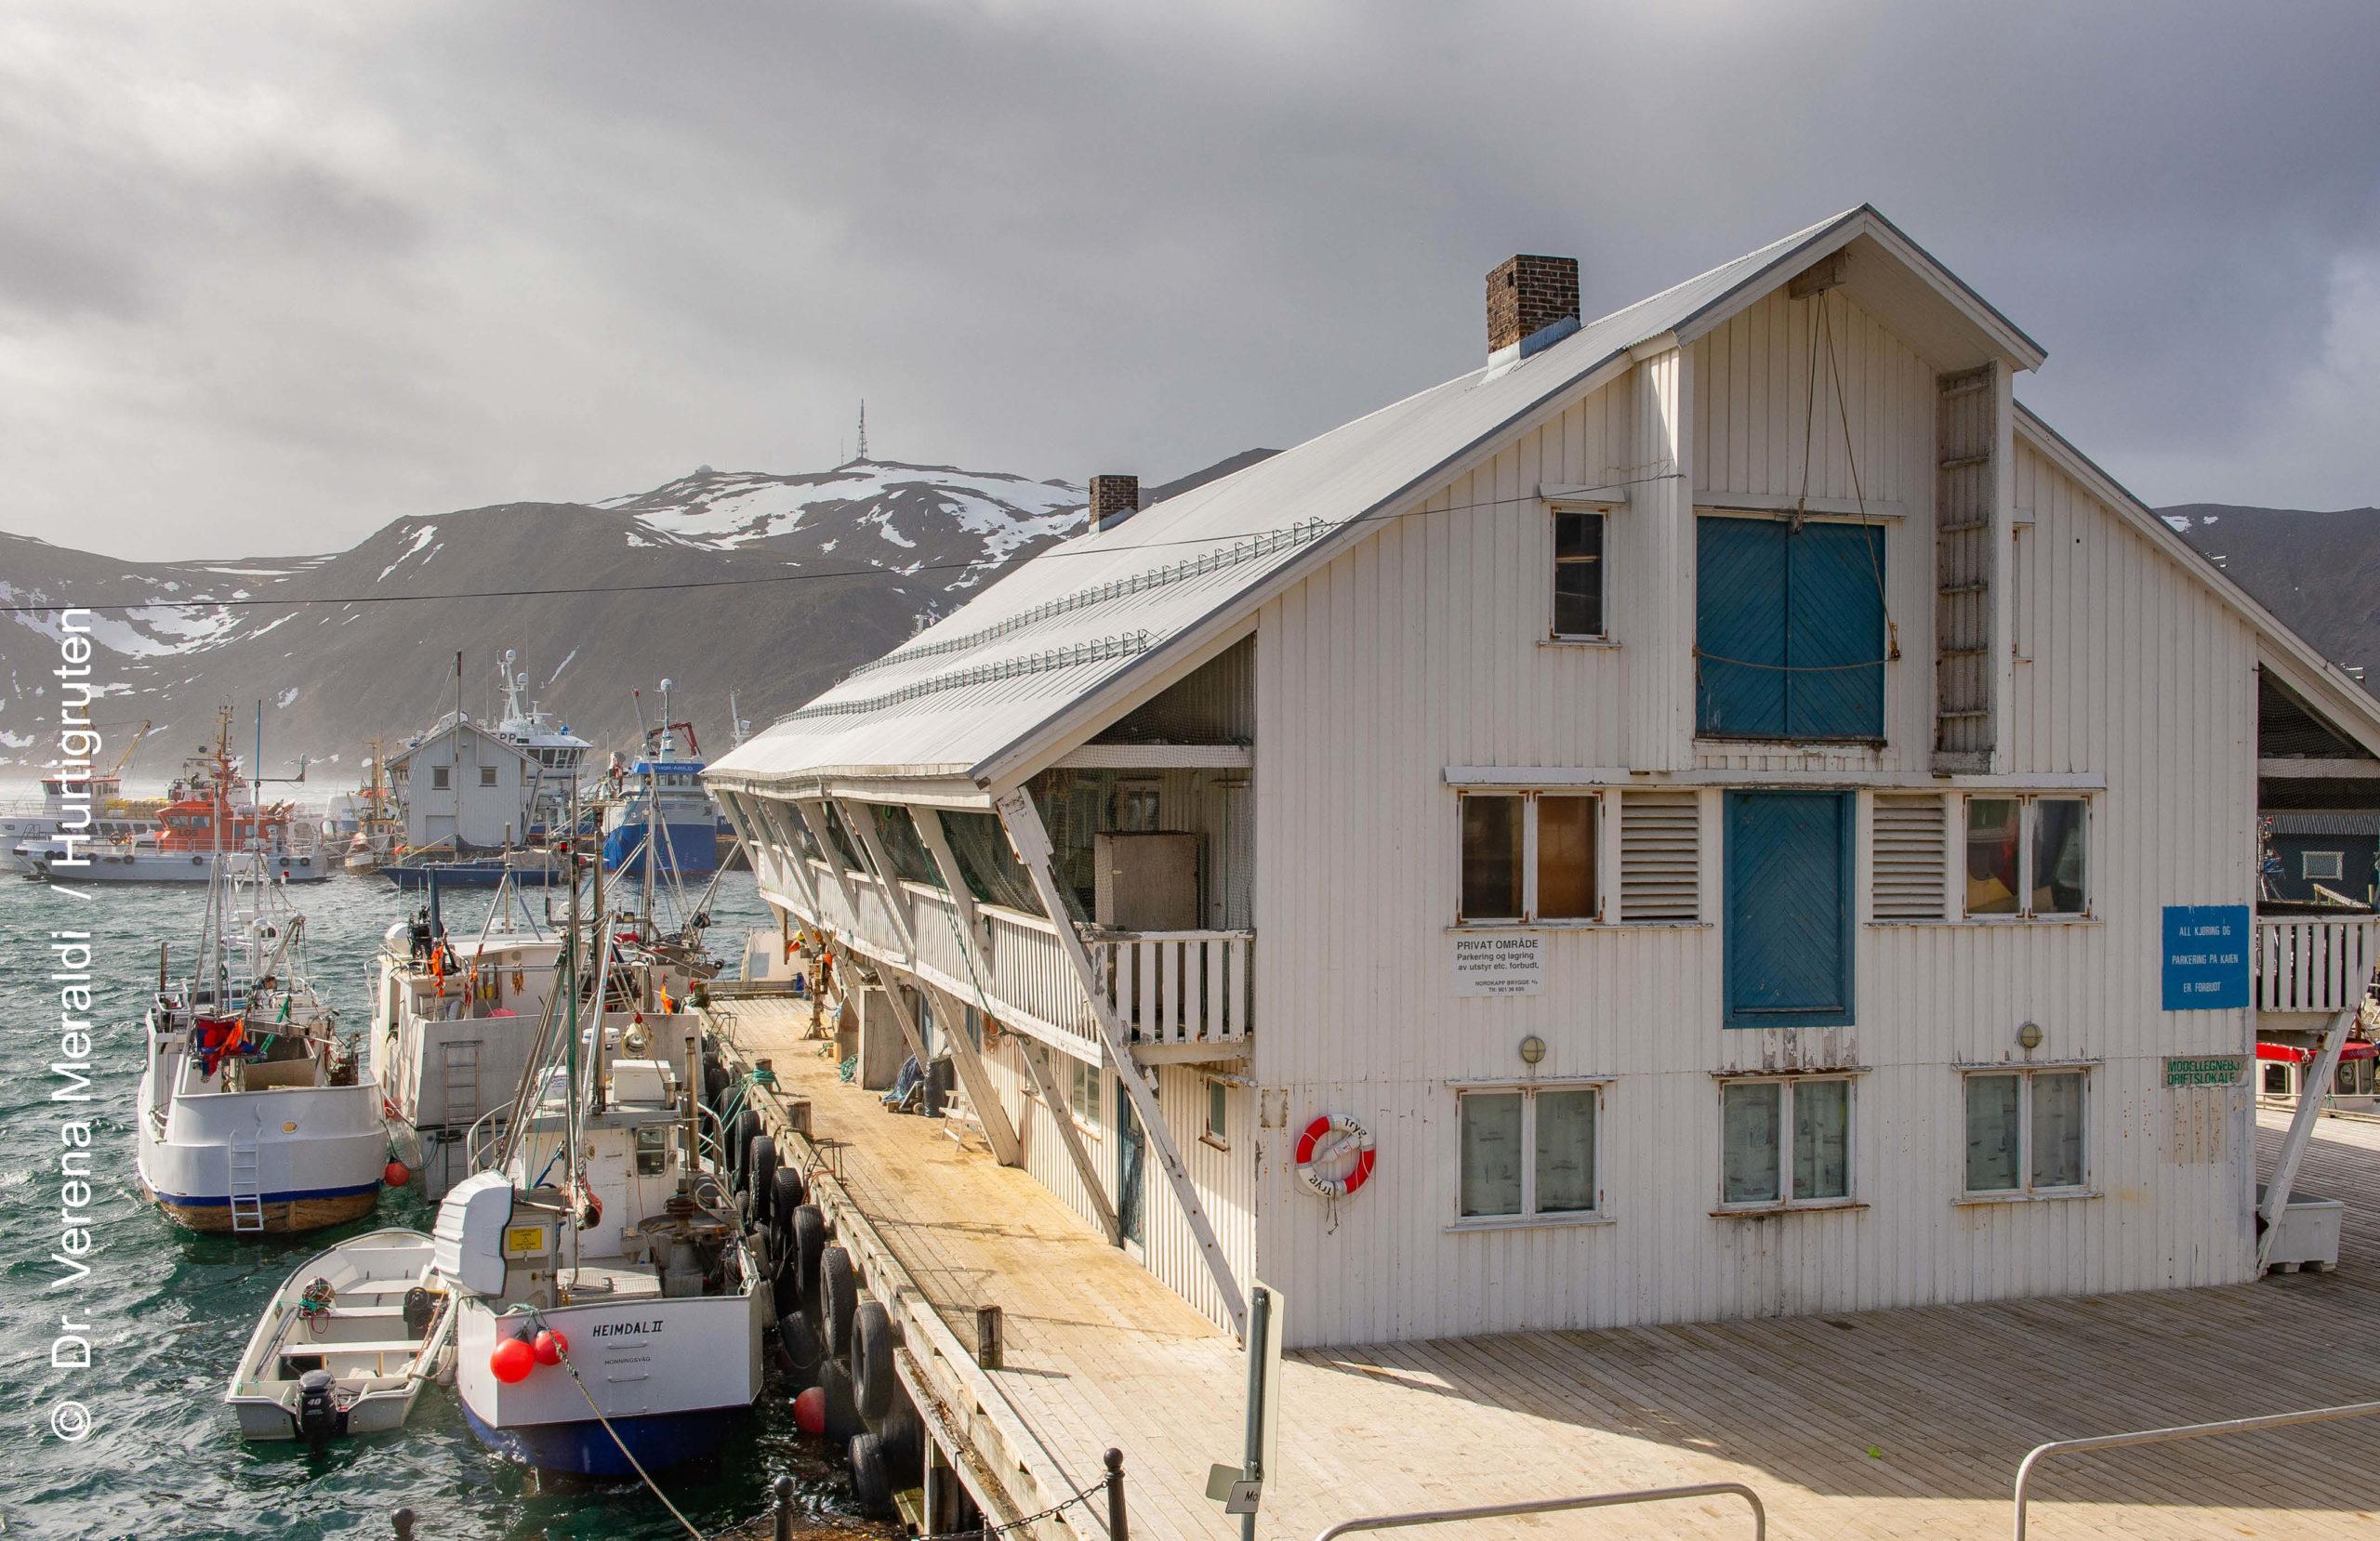 Hurtigruten Expedition Honningsvag Nordkap